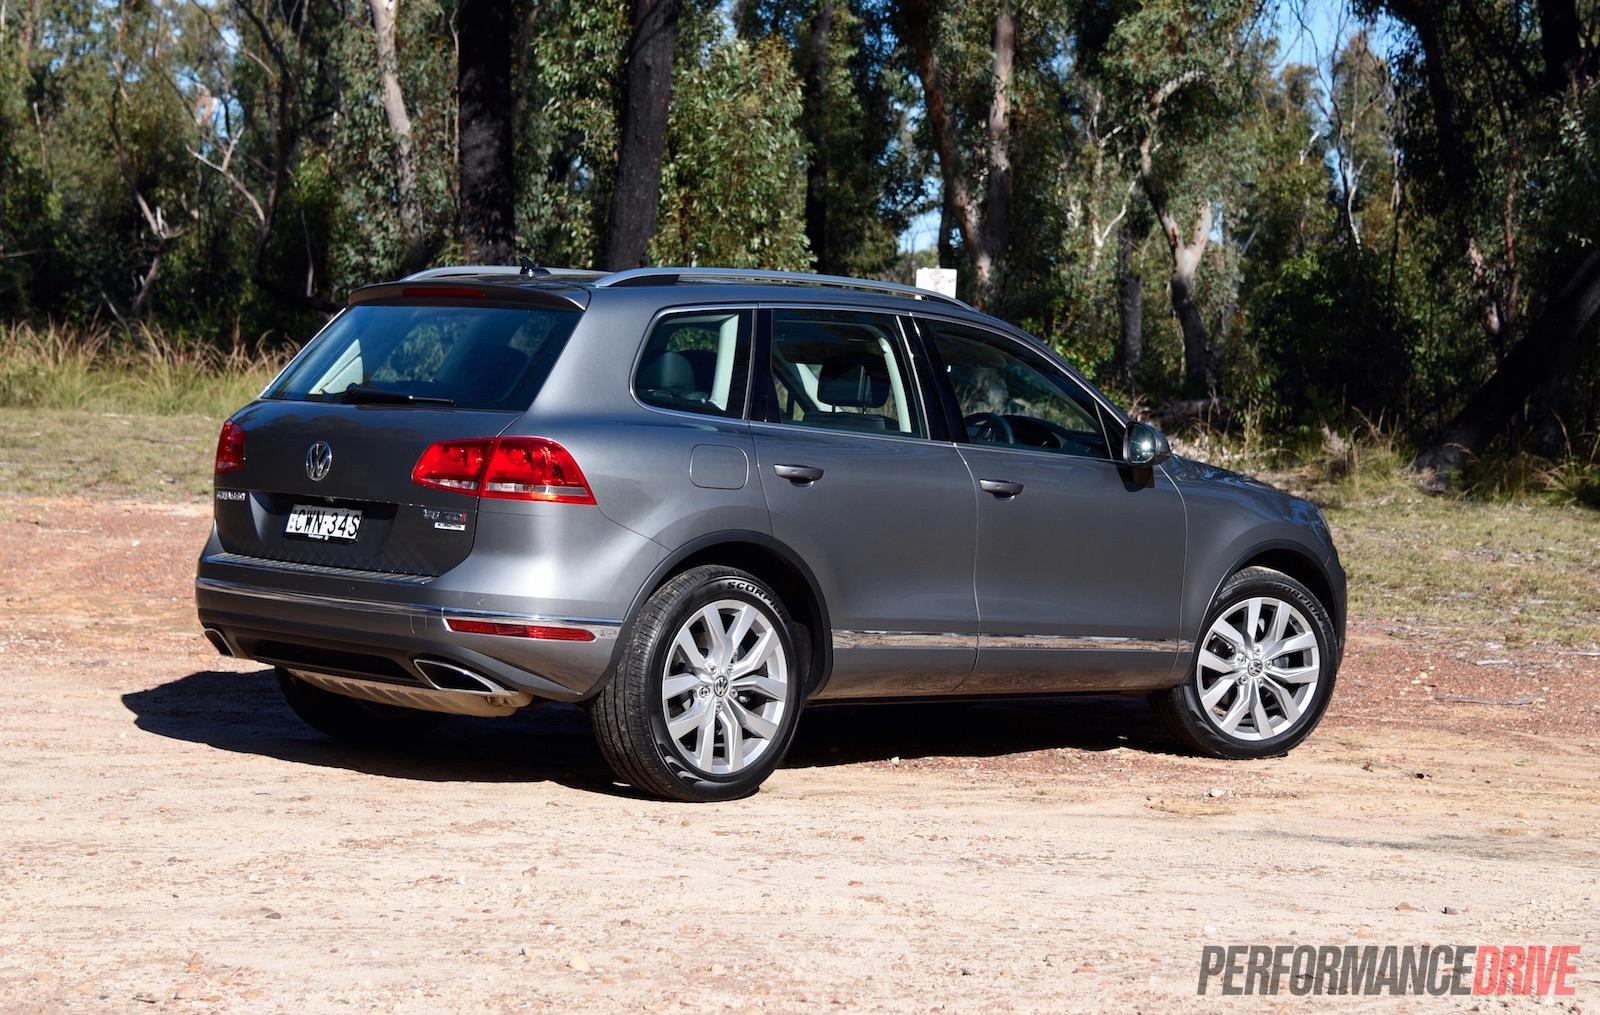 2015 Volkswagen Touareg V6 Tdi Review Video Performancedrive